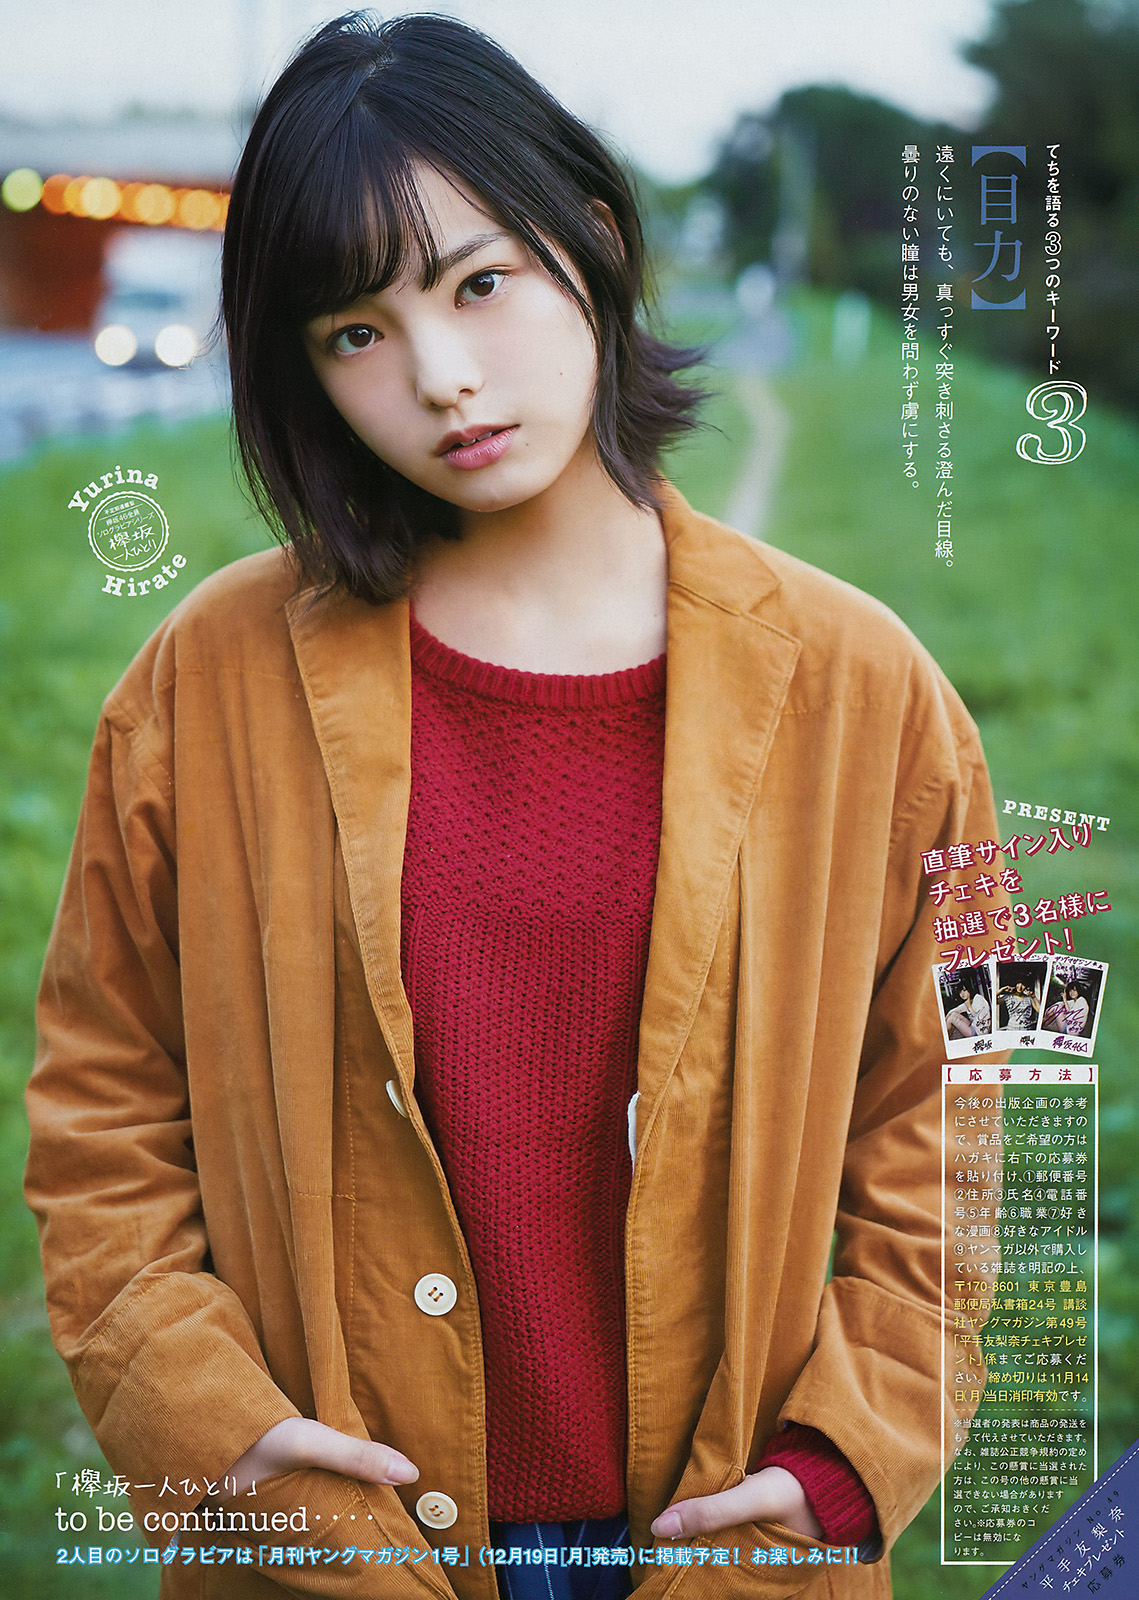 Hirate Yurina 平手友梨奈 Keyakizaka46, Young Magazine 2016.11.21 No.49 (週刊ヤングマガジン 2016年49号)